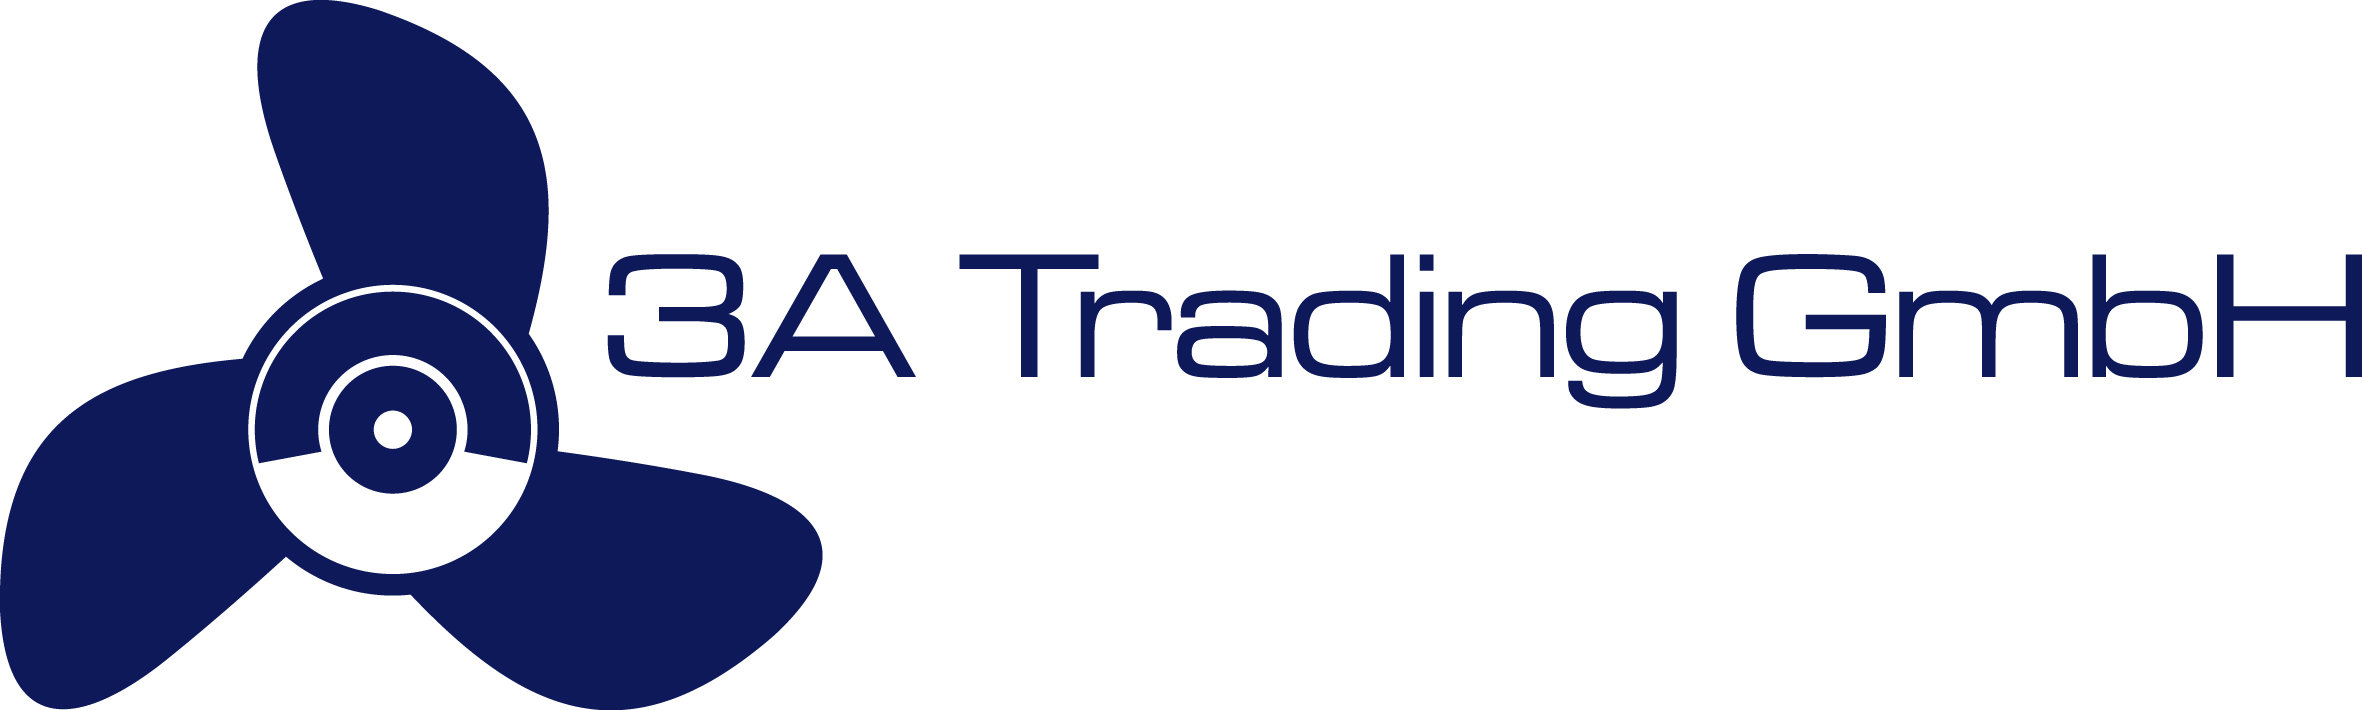 3A Trading GmbH Marineteile